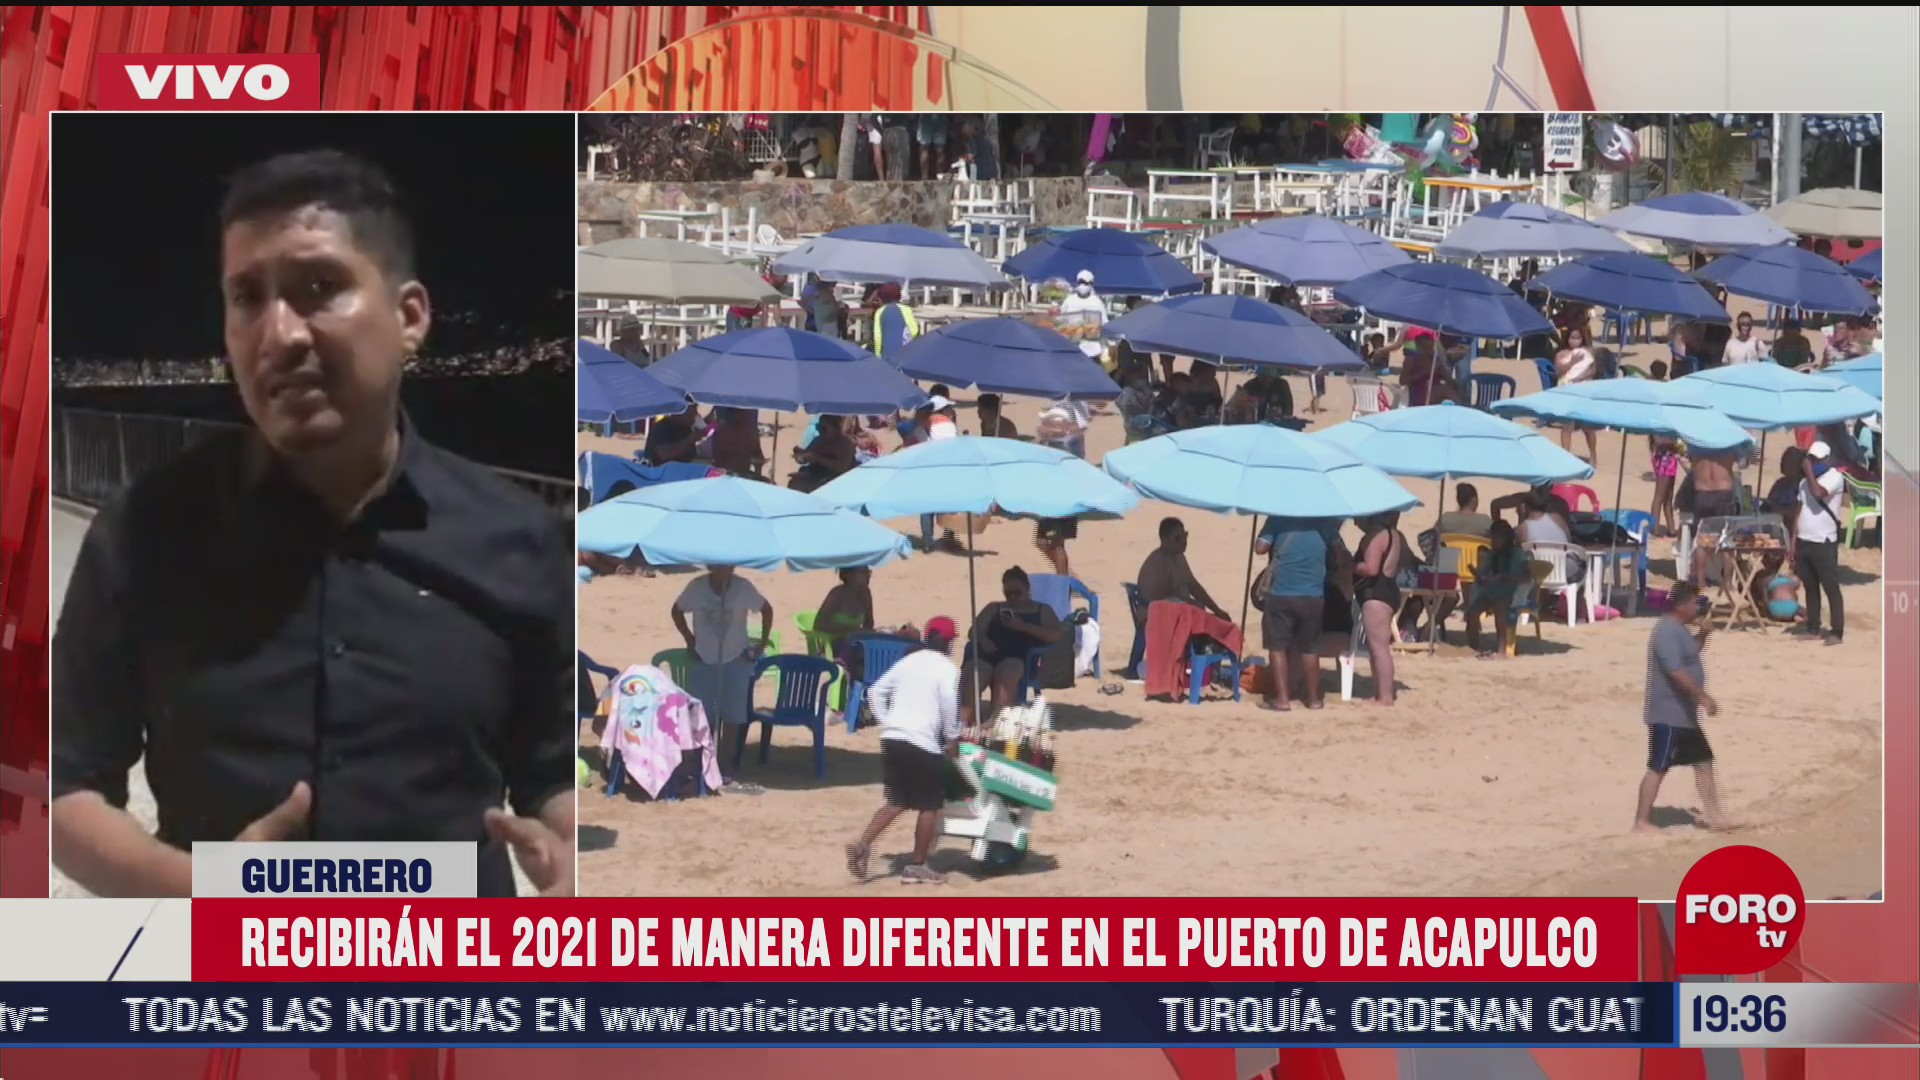 2021 llegara a acapulco sin gala pirotecnica